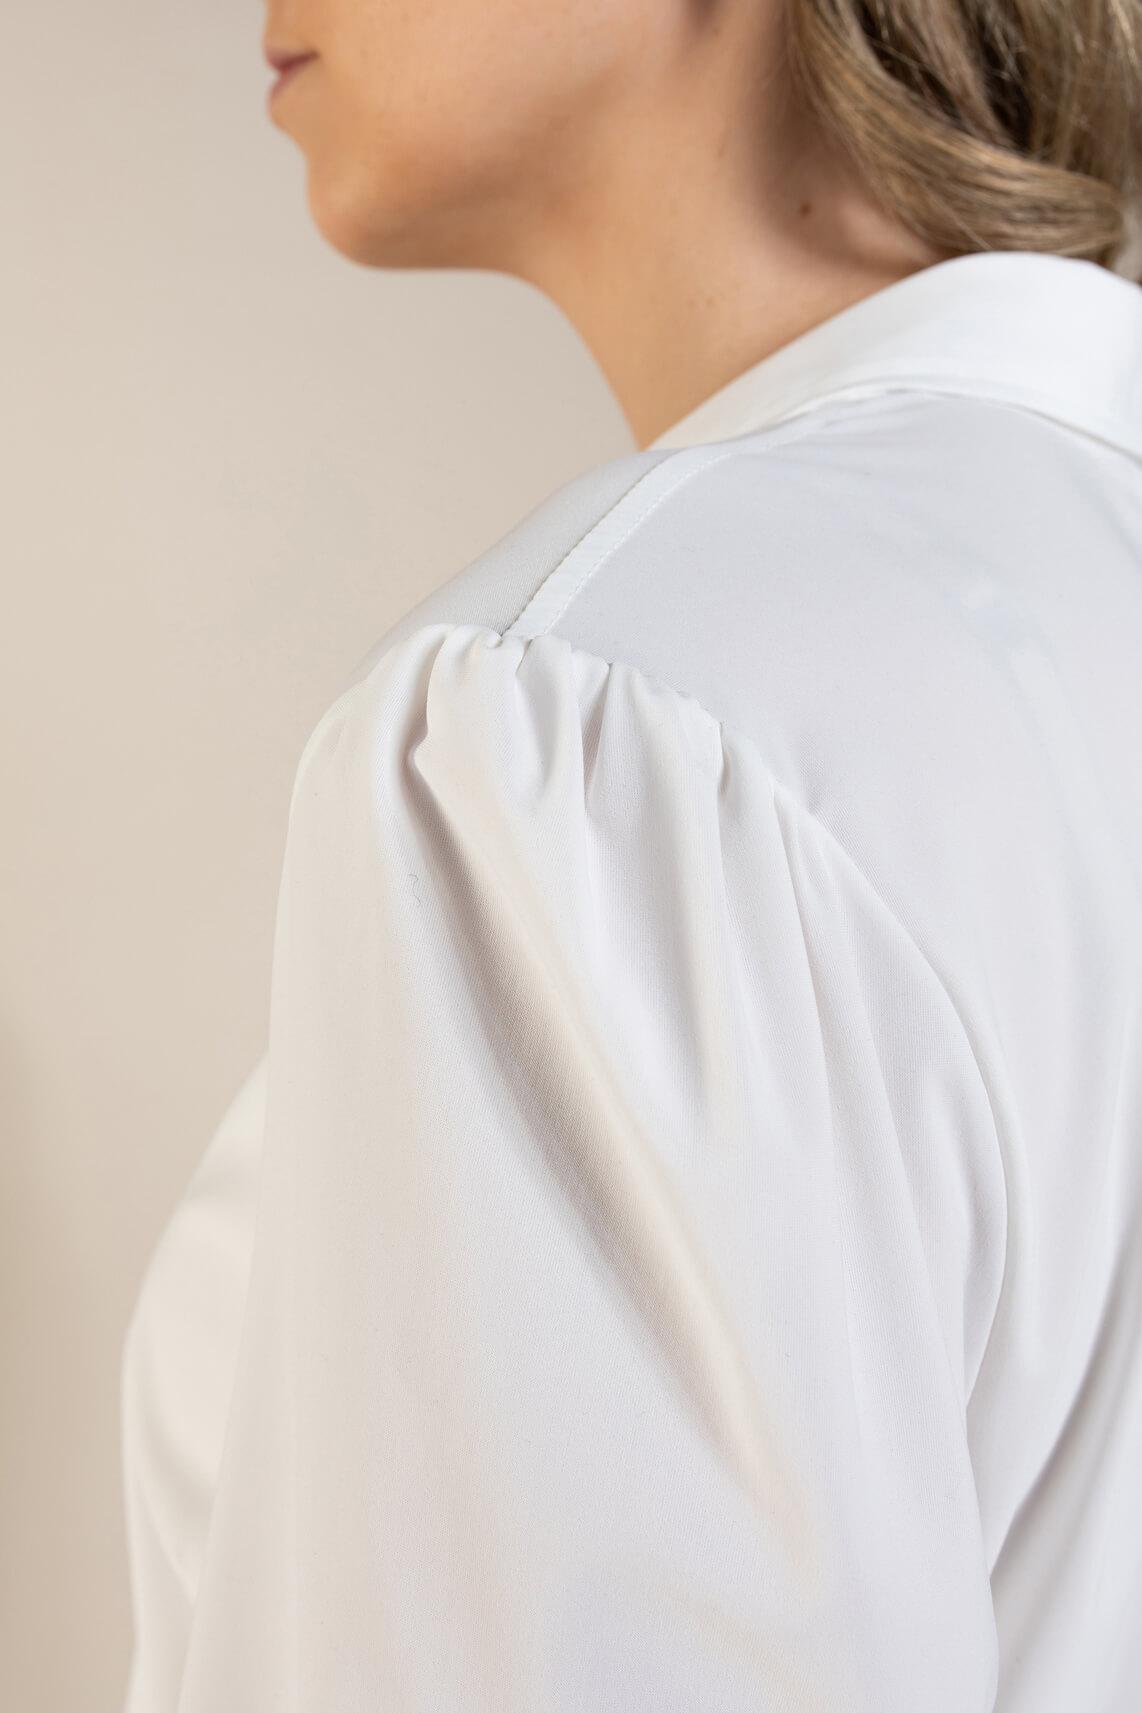 Anna Dames Jersey sensitive blouse wit